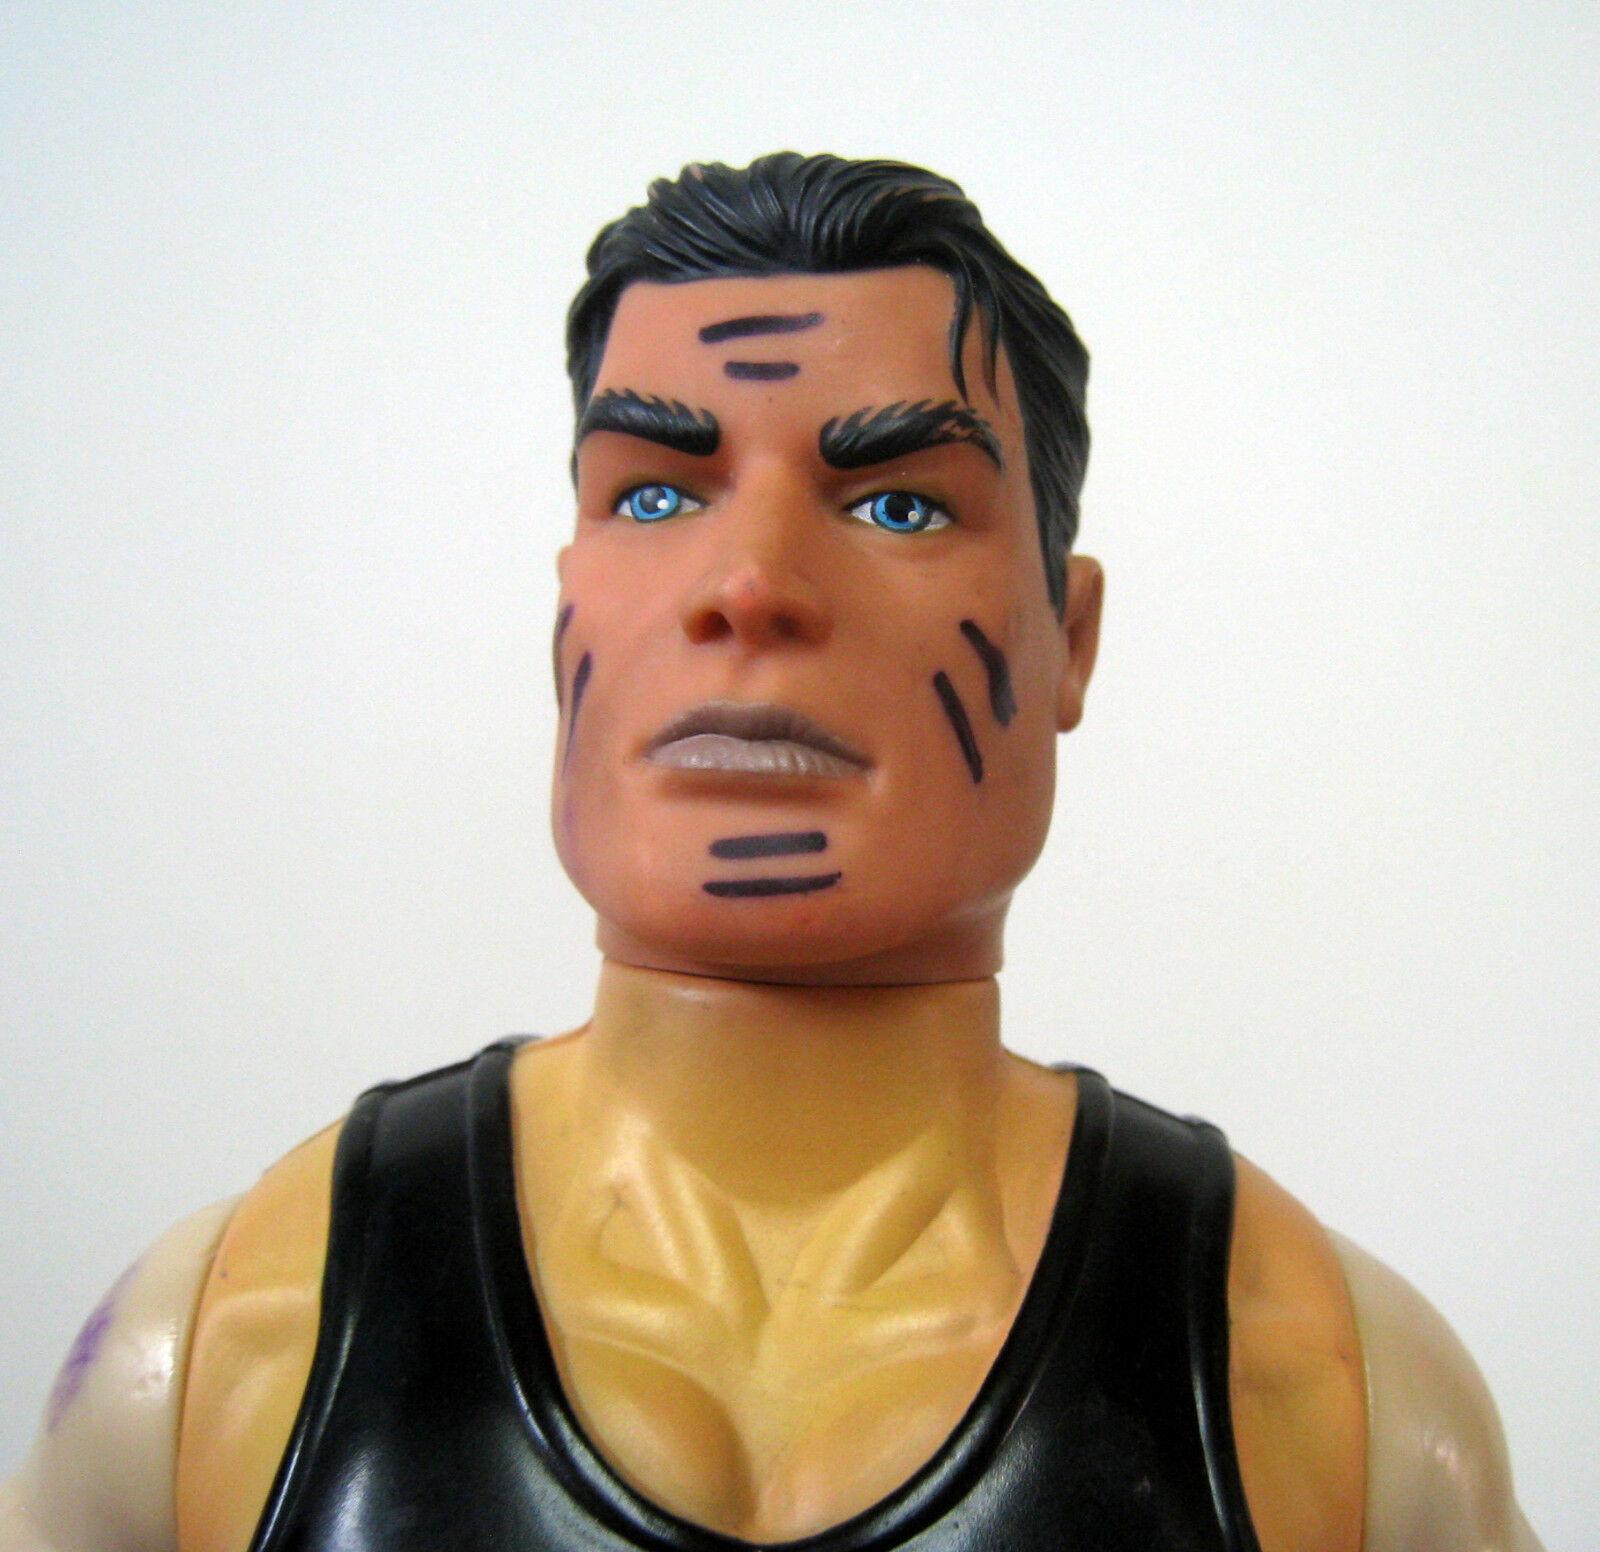 Seltene actionman action - man - figur 1999 figur hasbro - international